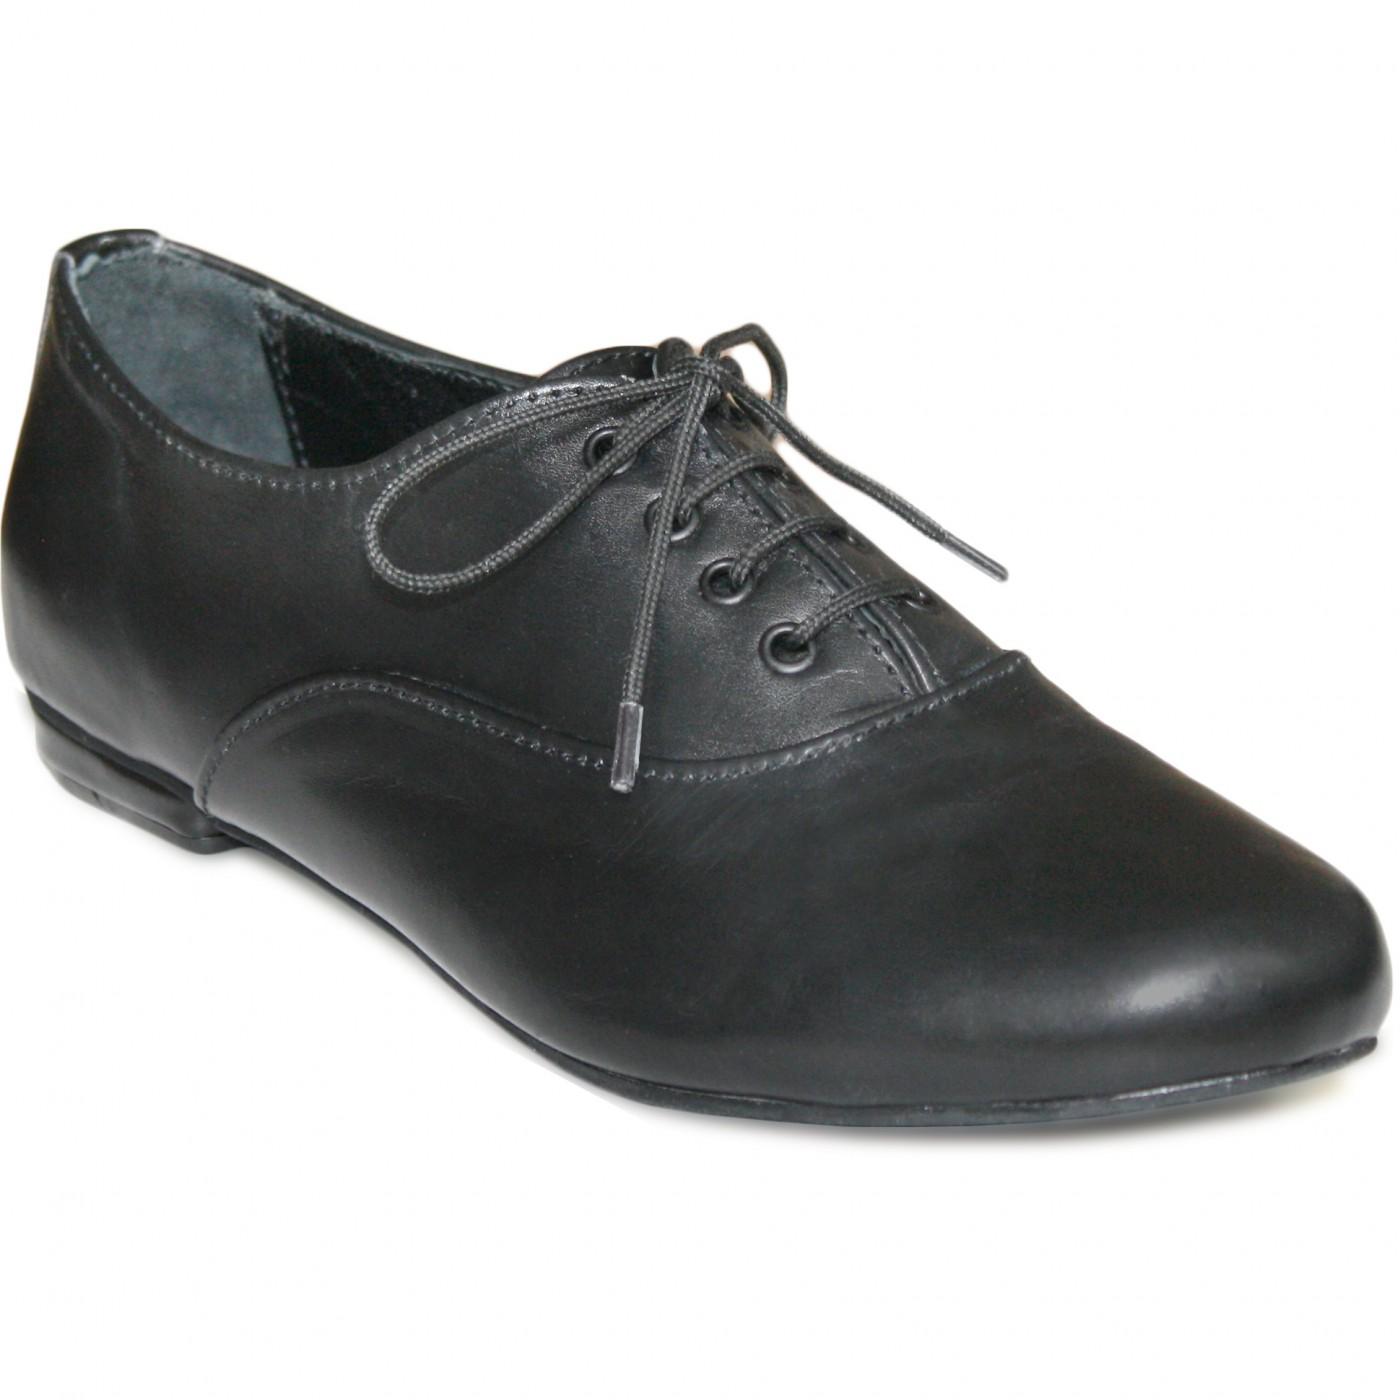 43f1546812f786 Damen Halbschuh Oxford lederschuhe aus Glattleder in schwarz 1 ...